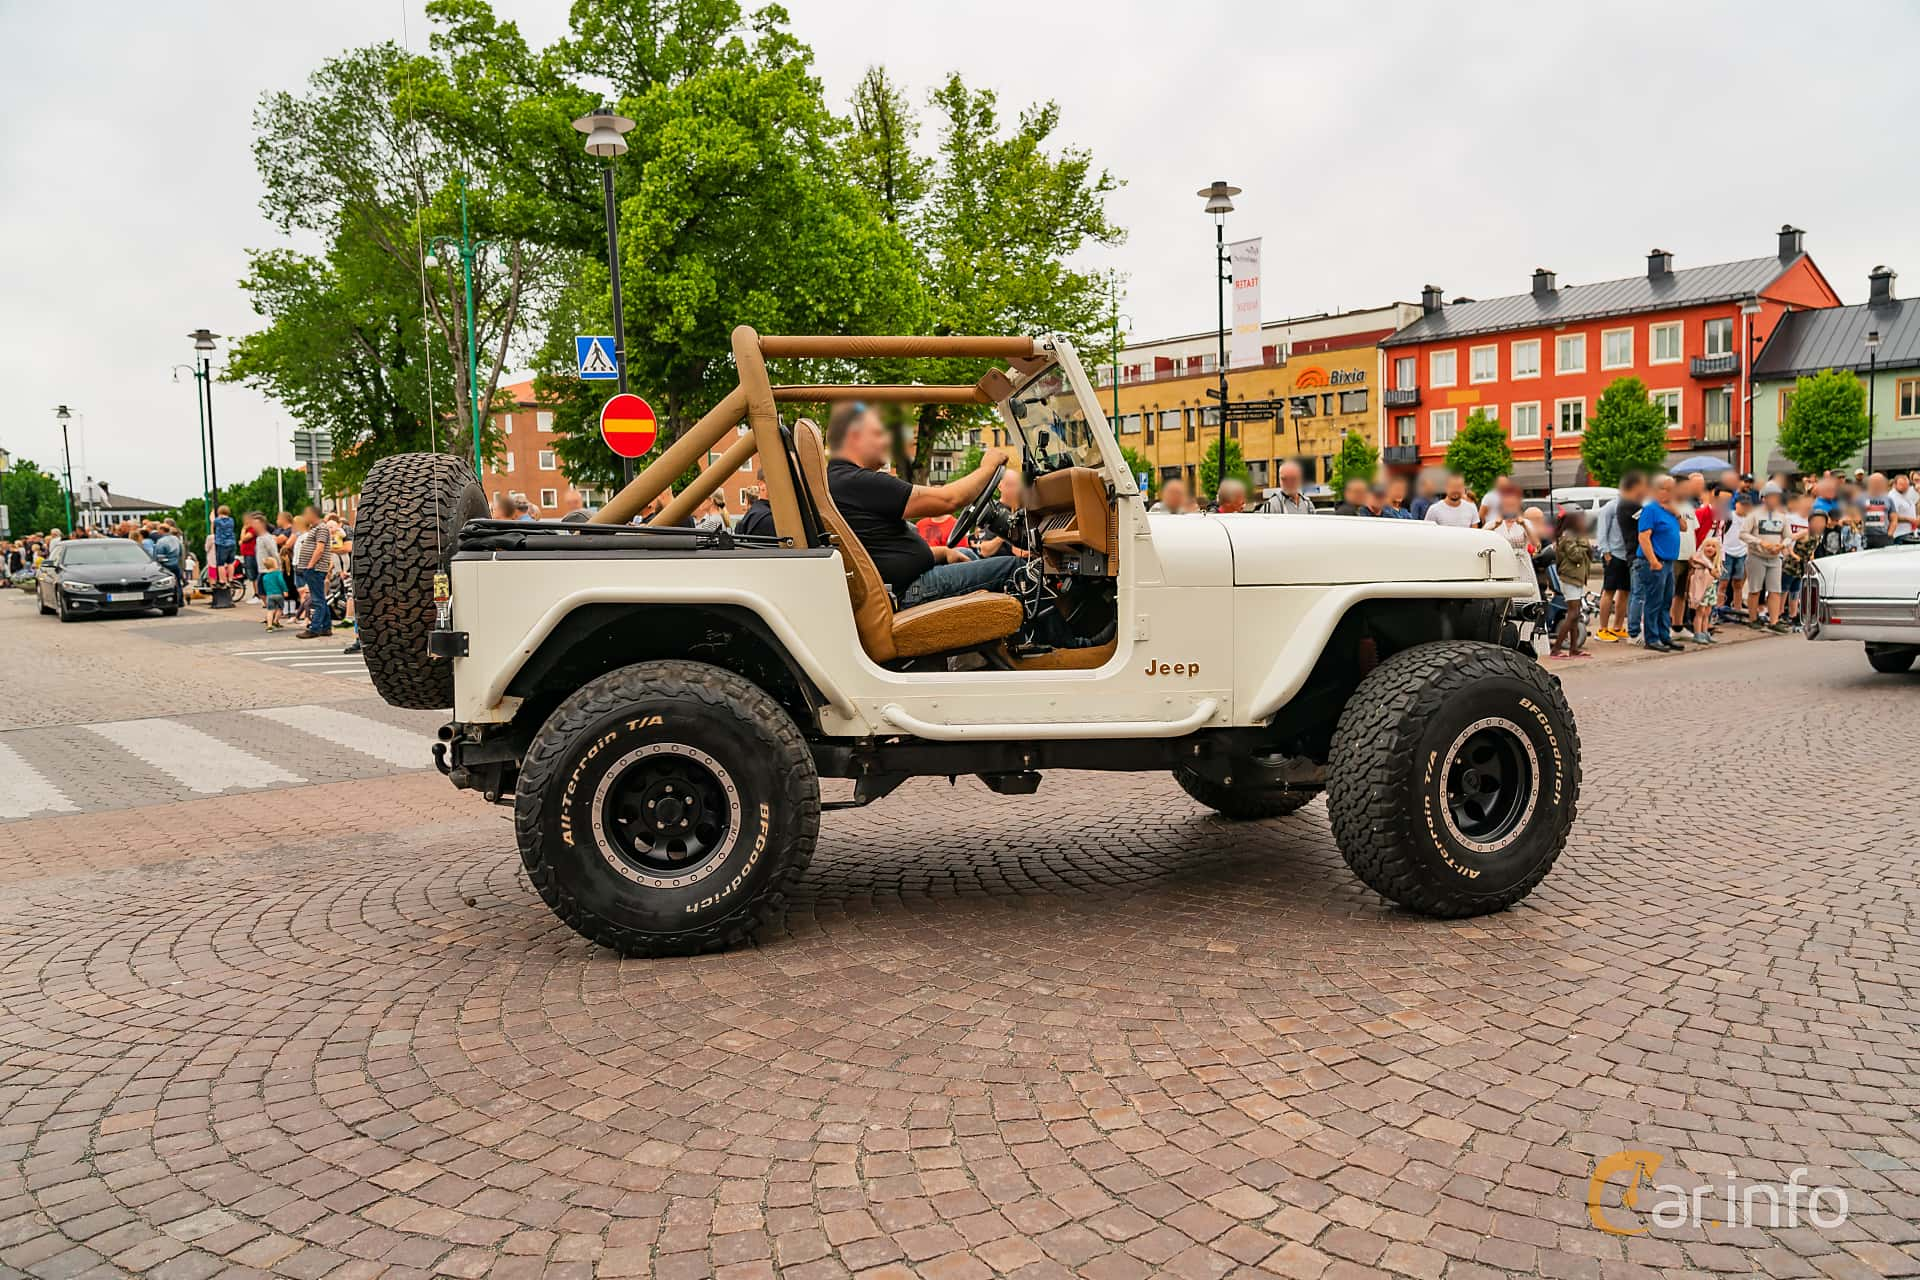 Jeep Wrangler 4.2 4WD Manual, 121hp, 1987 at Nässjö Cruising 2019